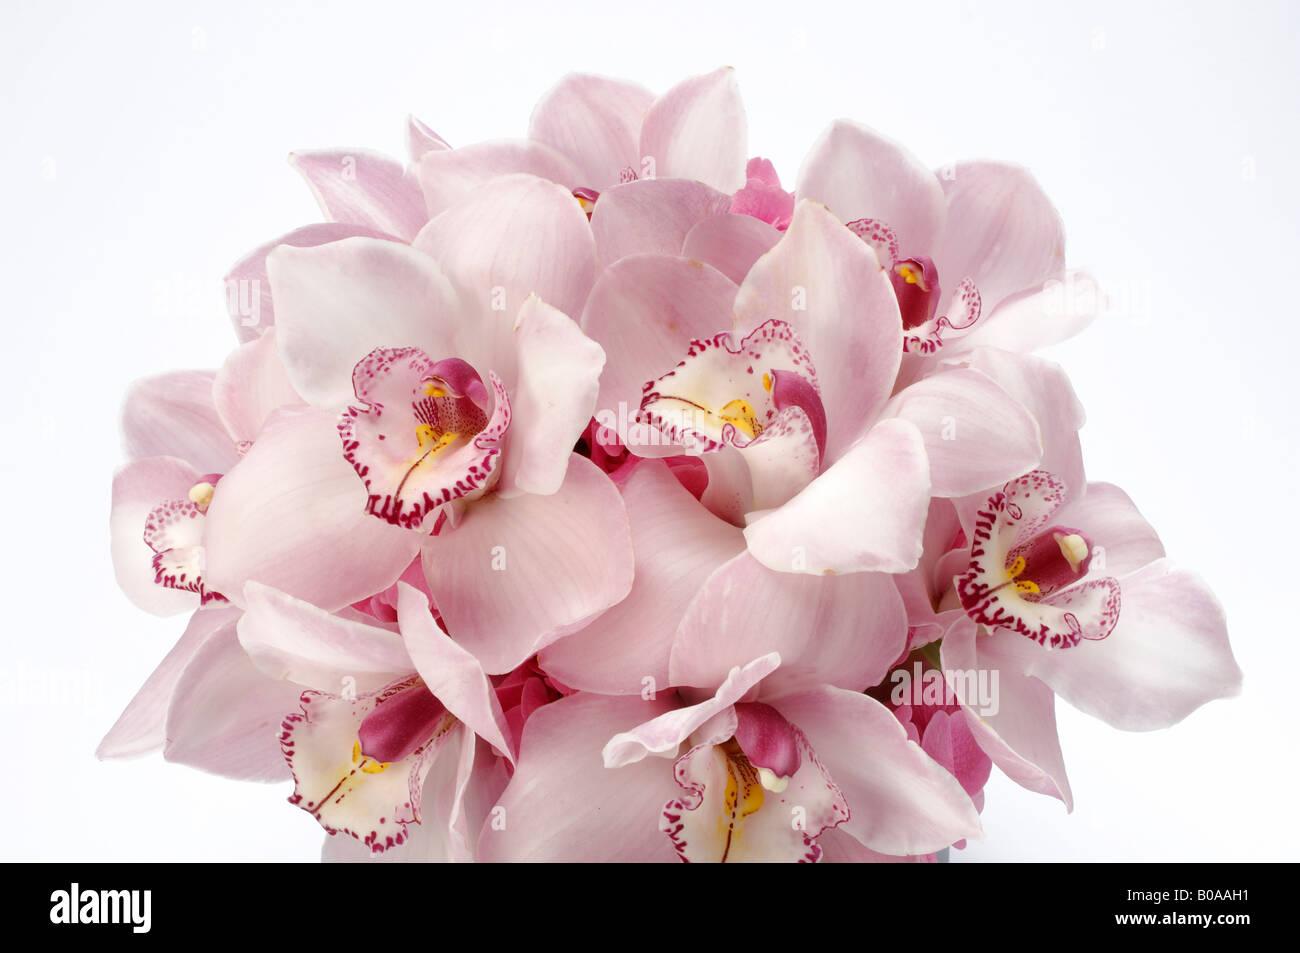 Ein Blumenstrauss angeordnet, rosa Cymbidium Orchideen Stockbild